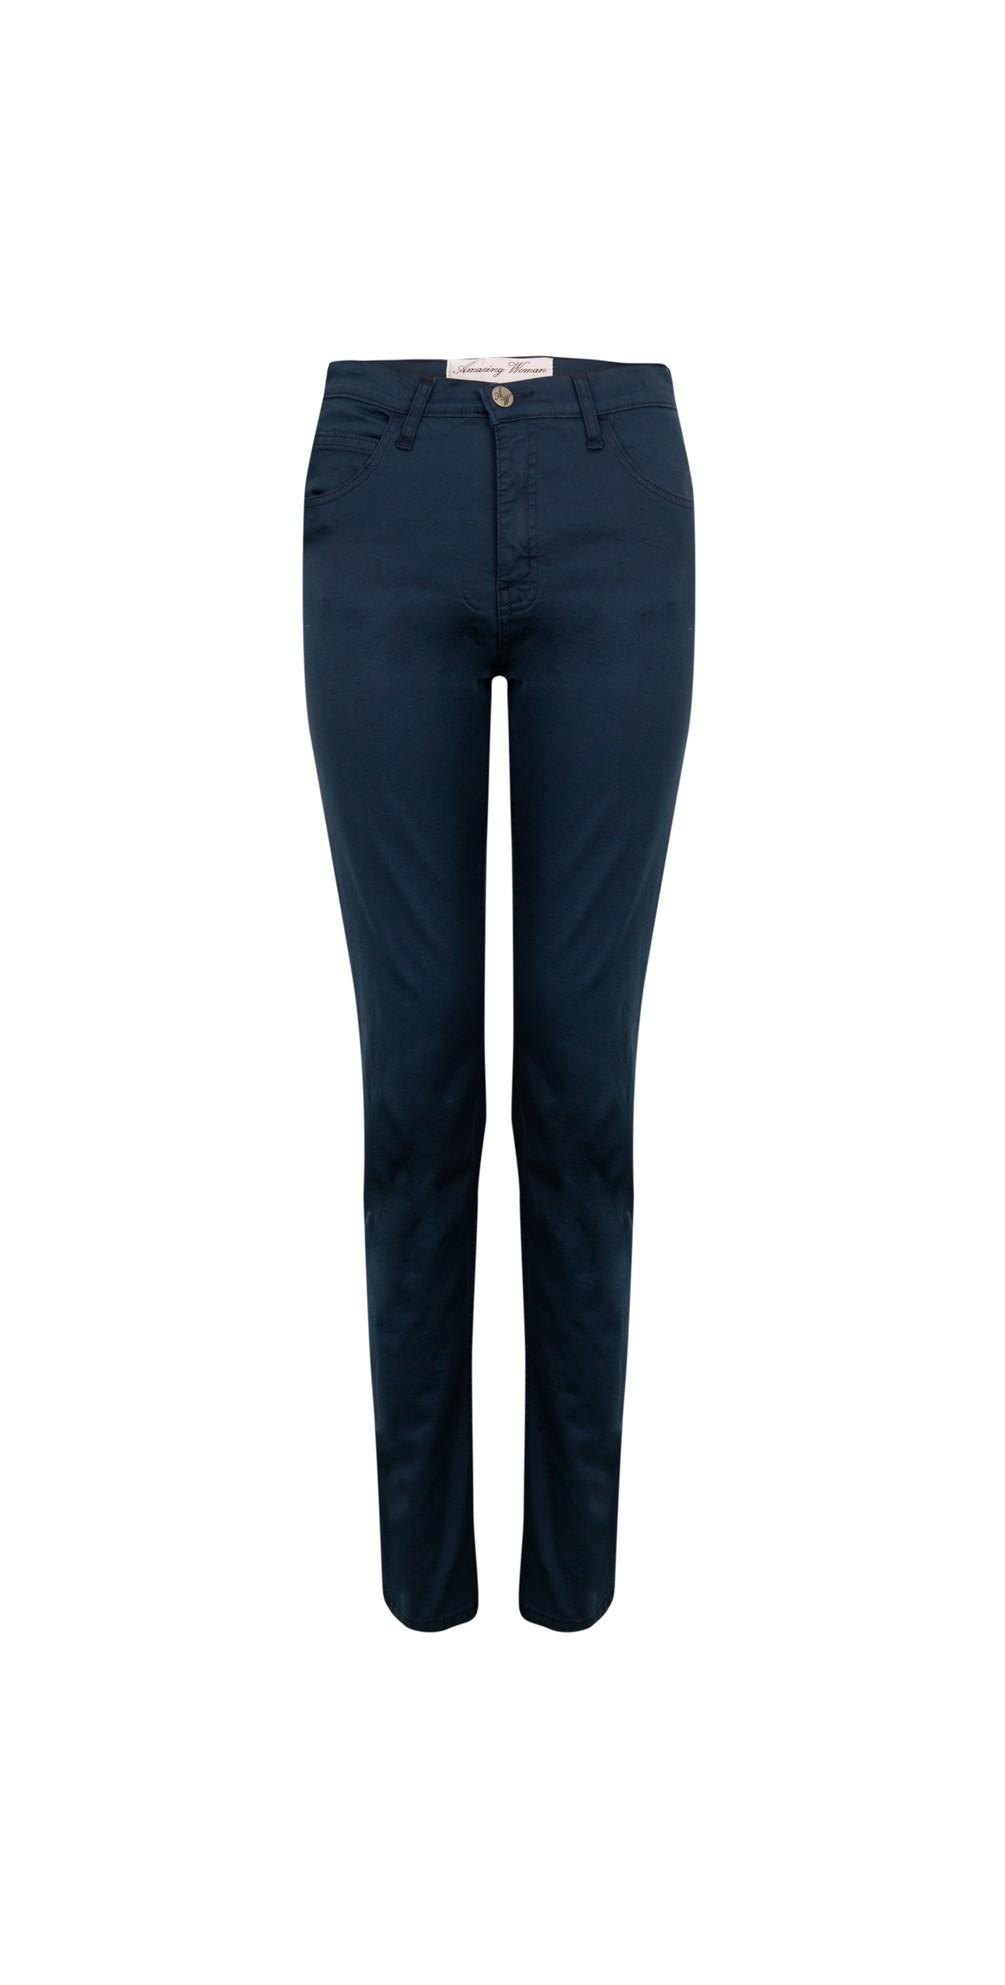 Moonlite 02 Slimfit Cotton Stretch Jean  main image